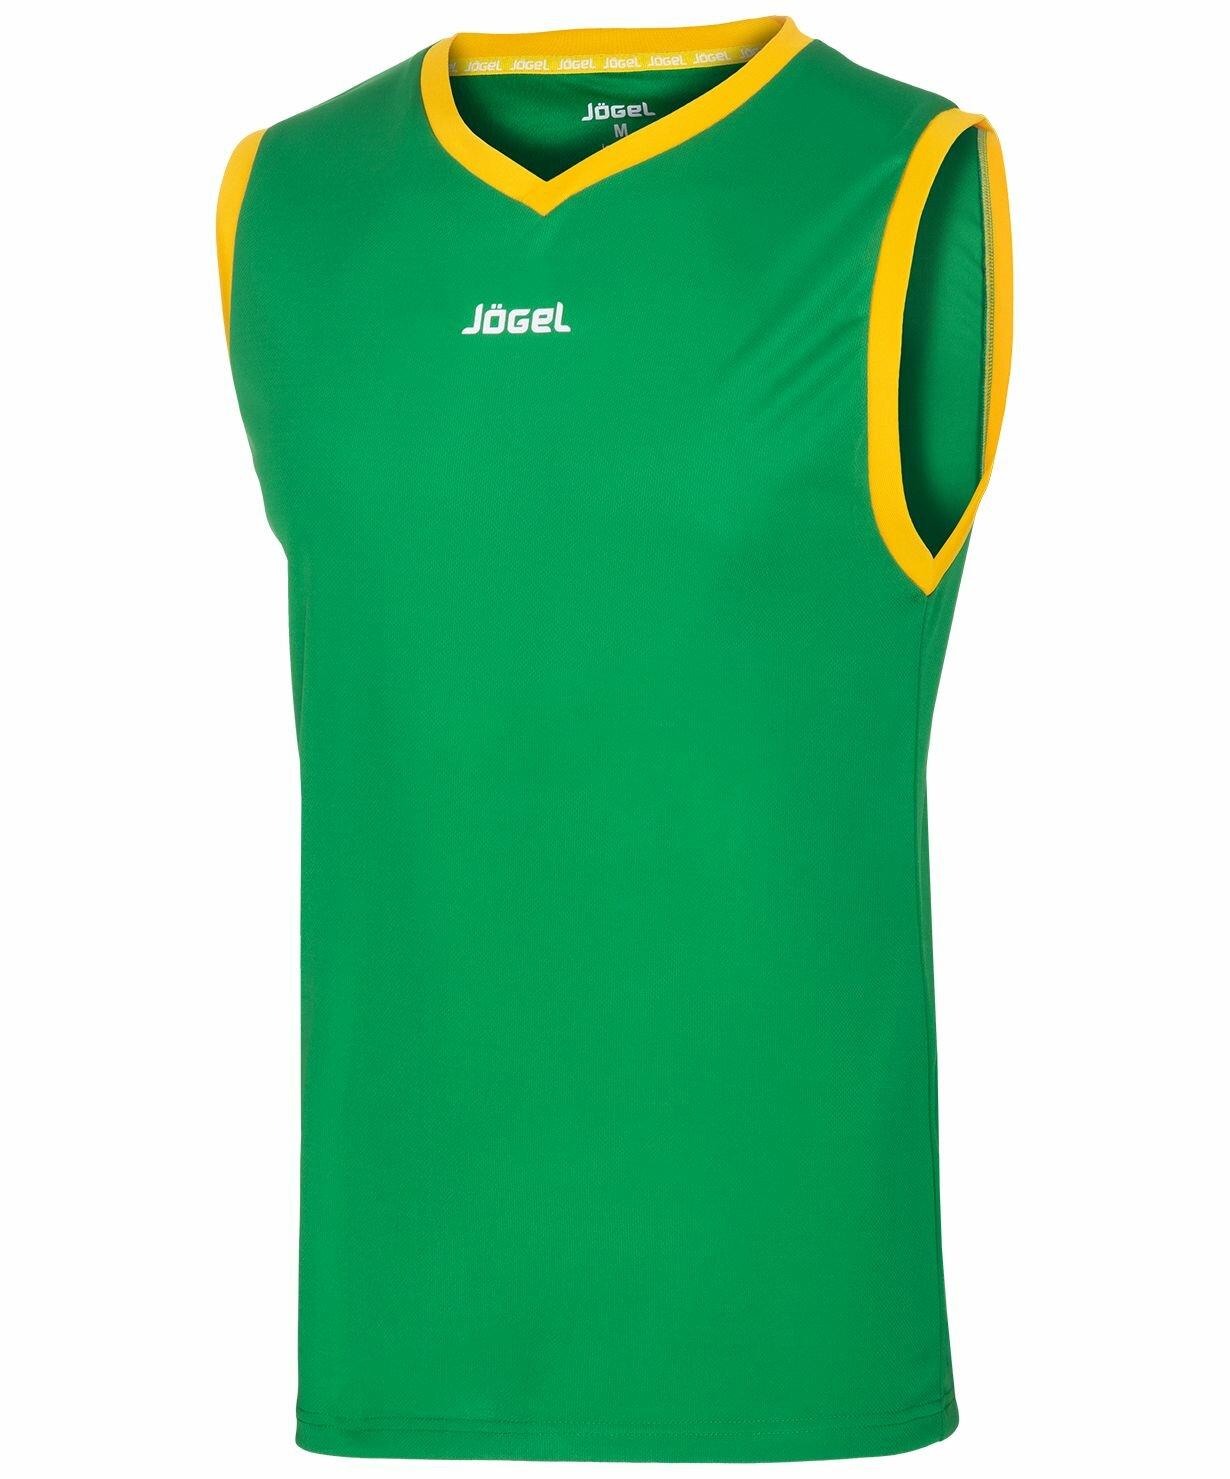 90aade88 Майка баскетбольная JBT-1020-034, зеленый/ желтый